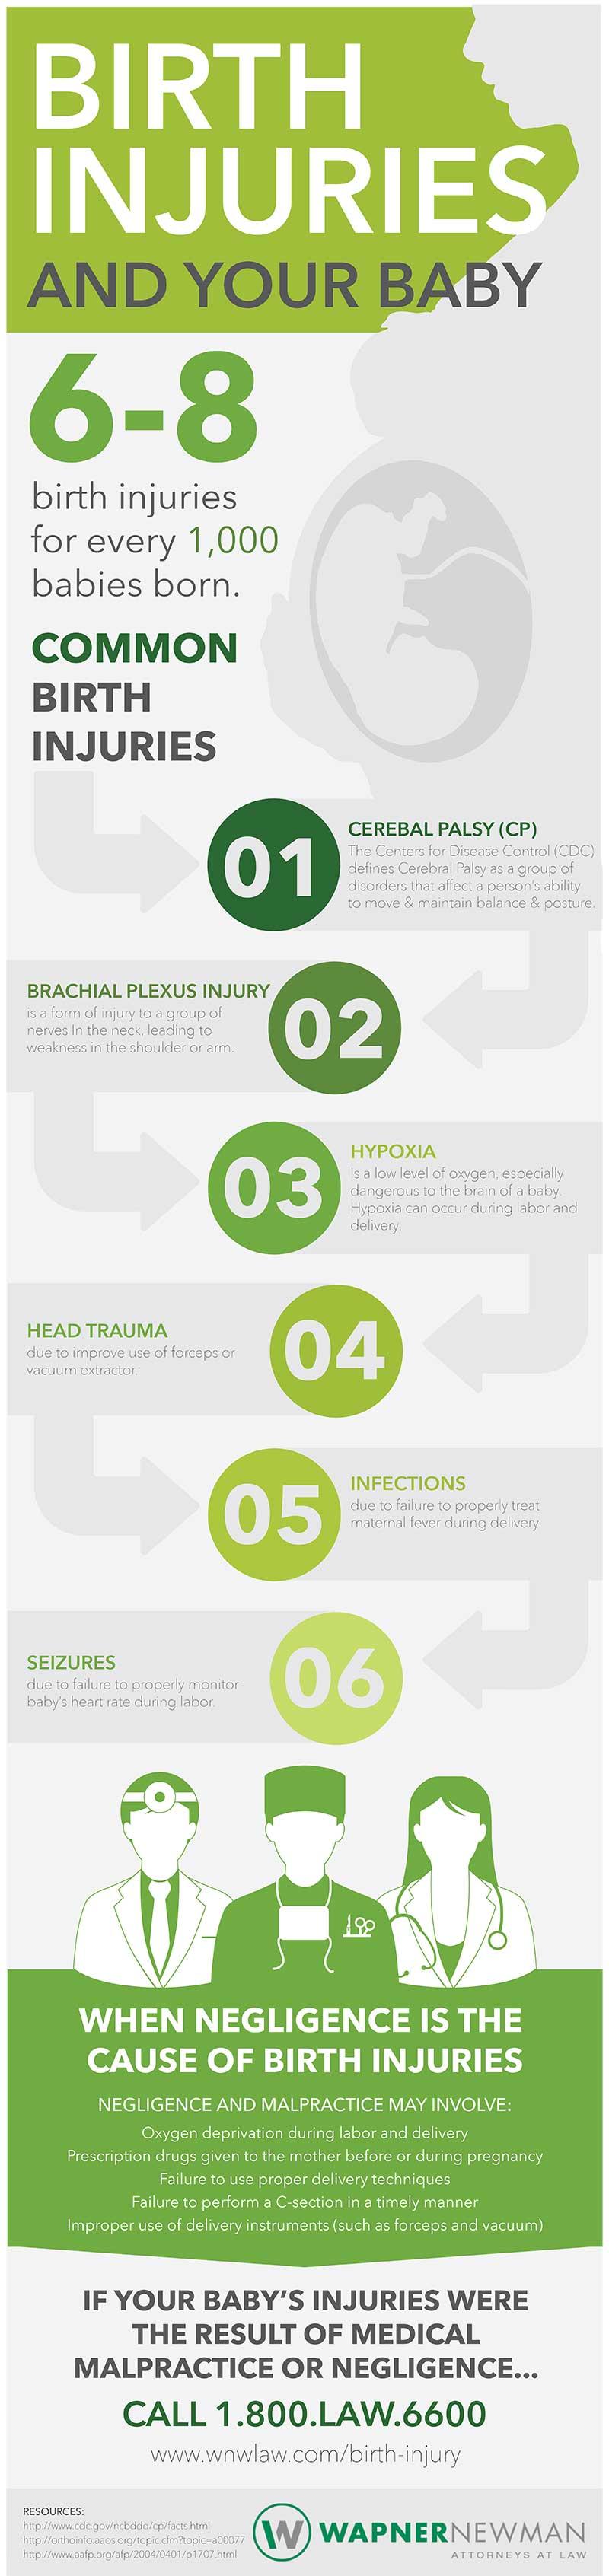 wnw birth injury infographic